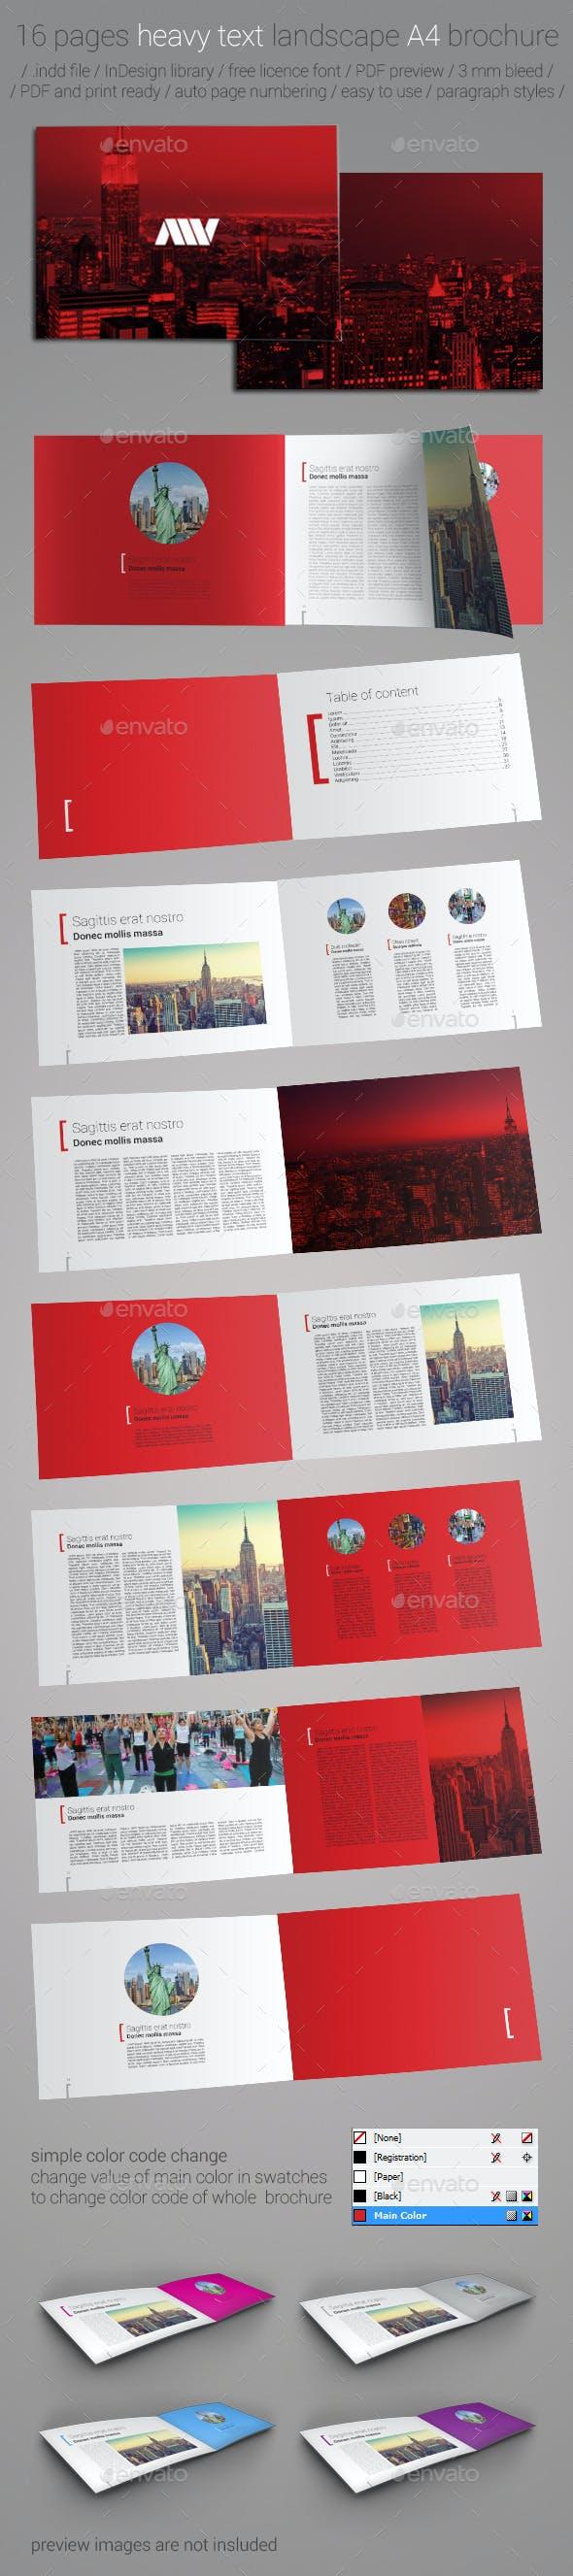 16 pages a4 landscape brochure template by miljan vulovic graphicriver